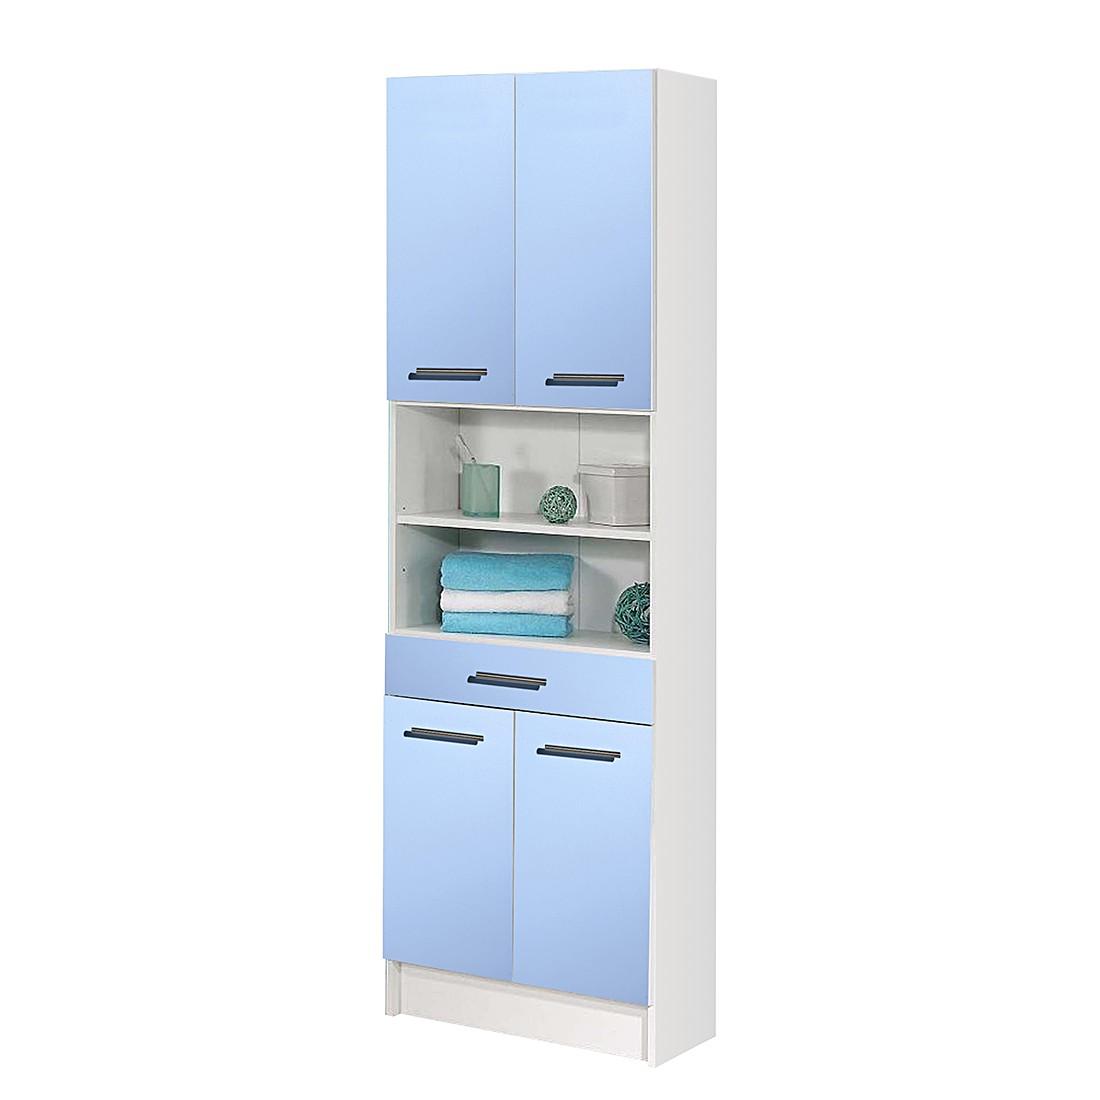 Armoire colonne Ottawa - Modèle large - Bleu clair, Schildmeyer